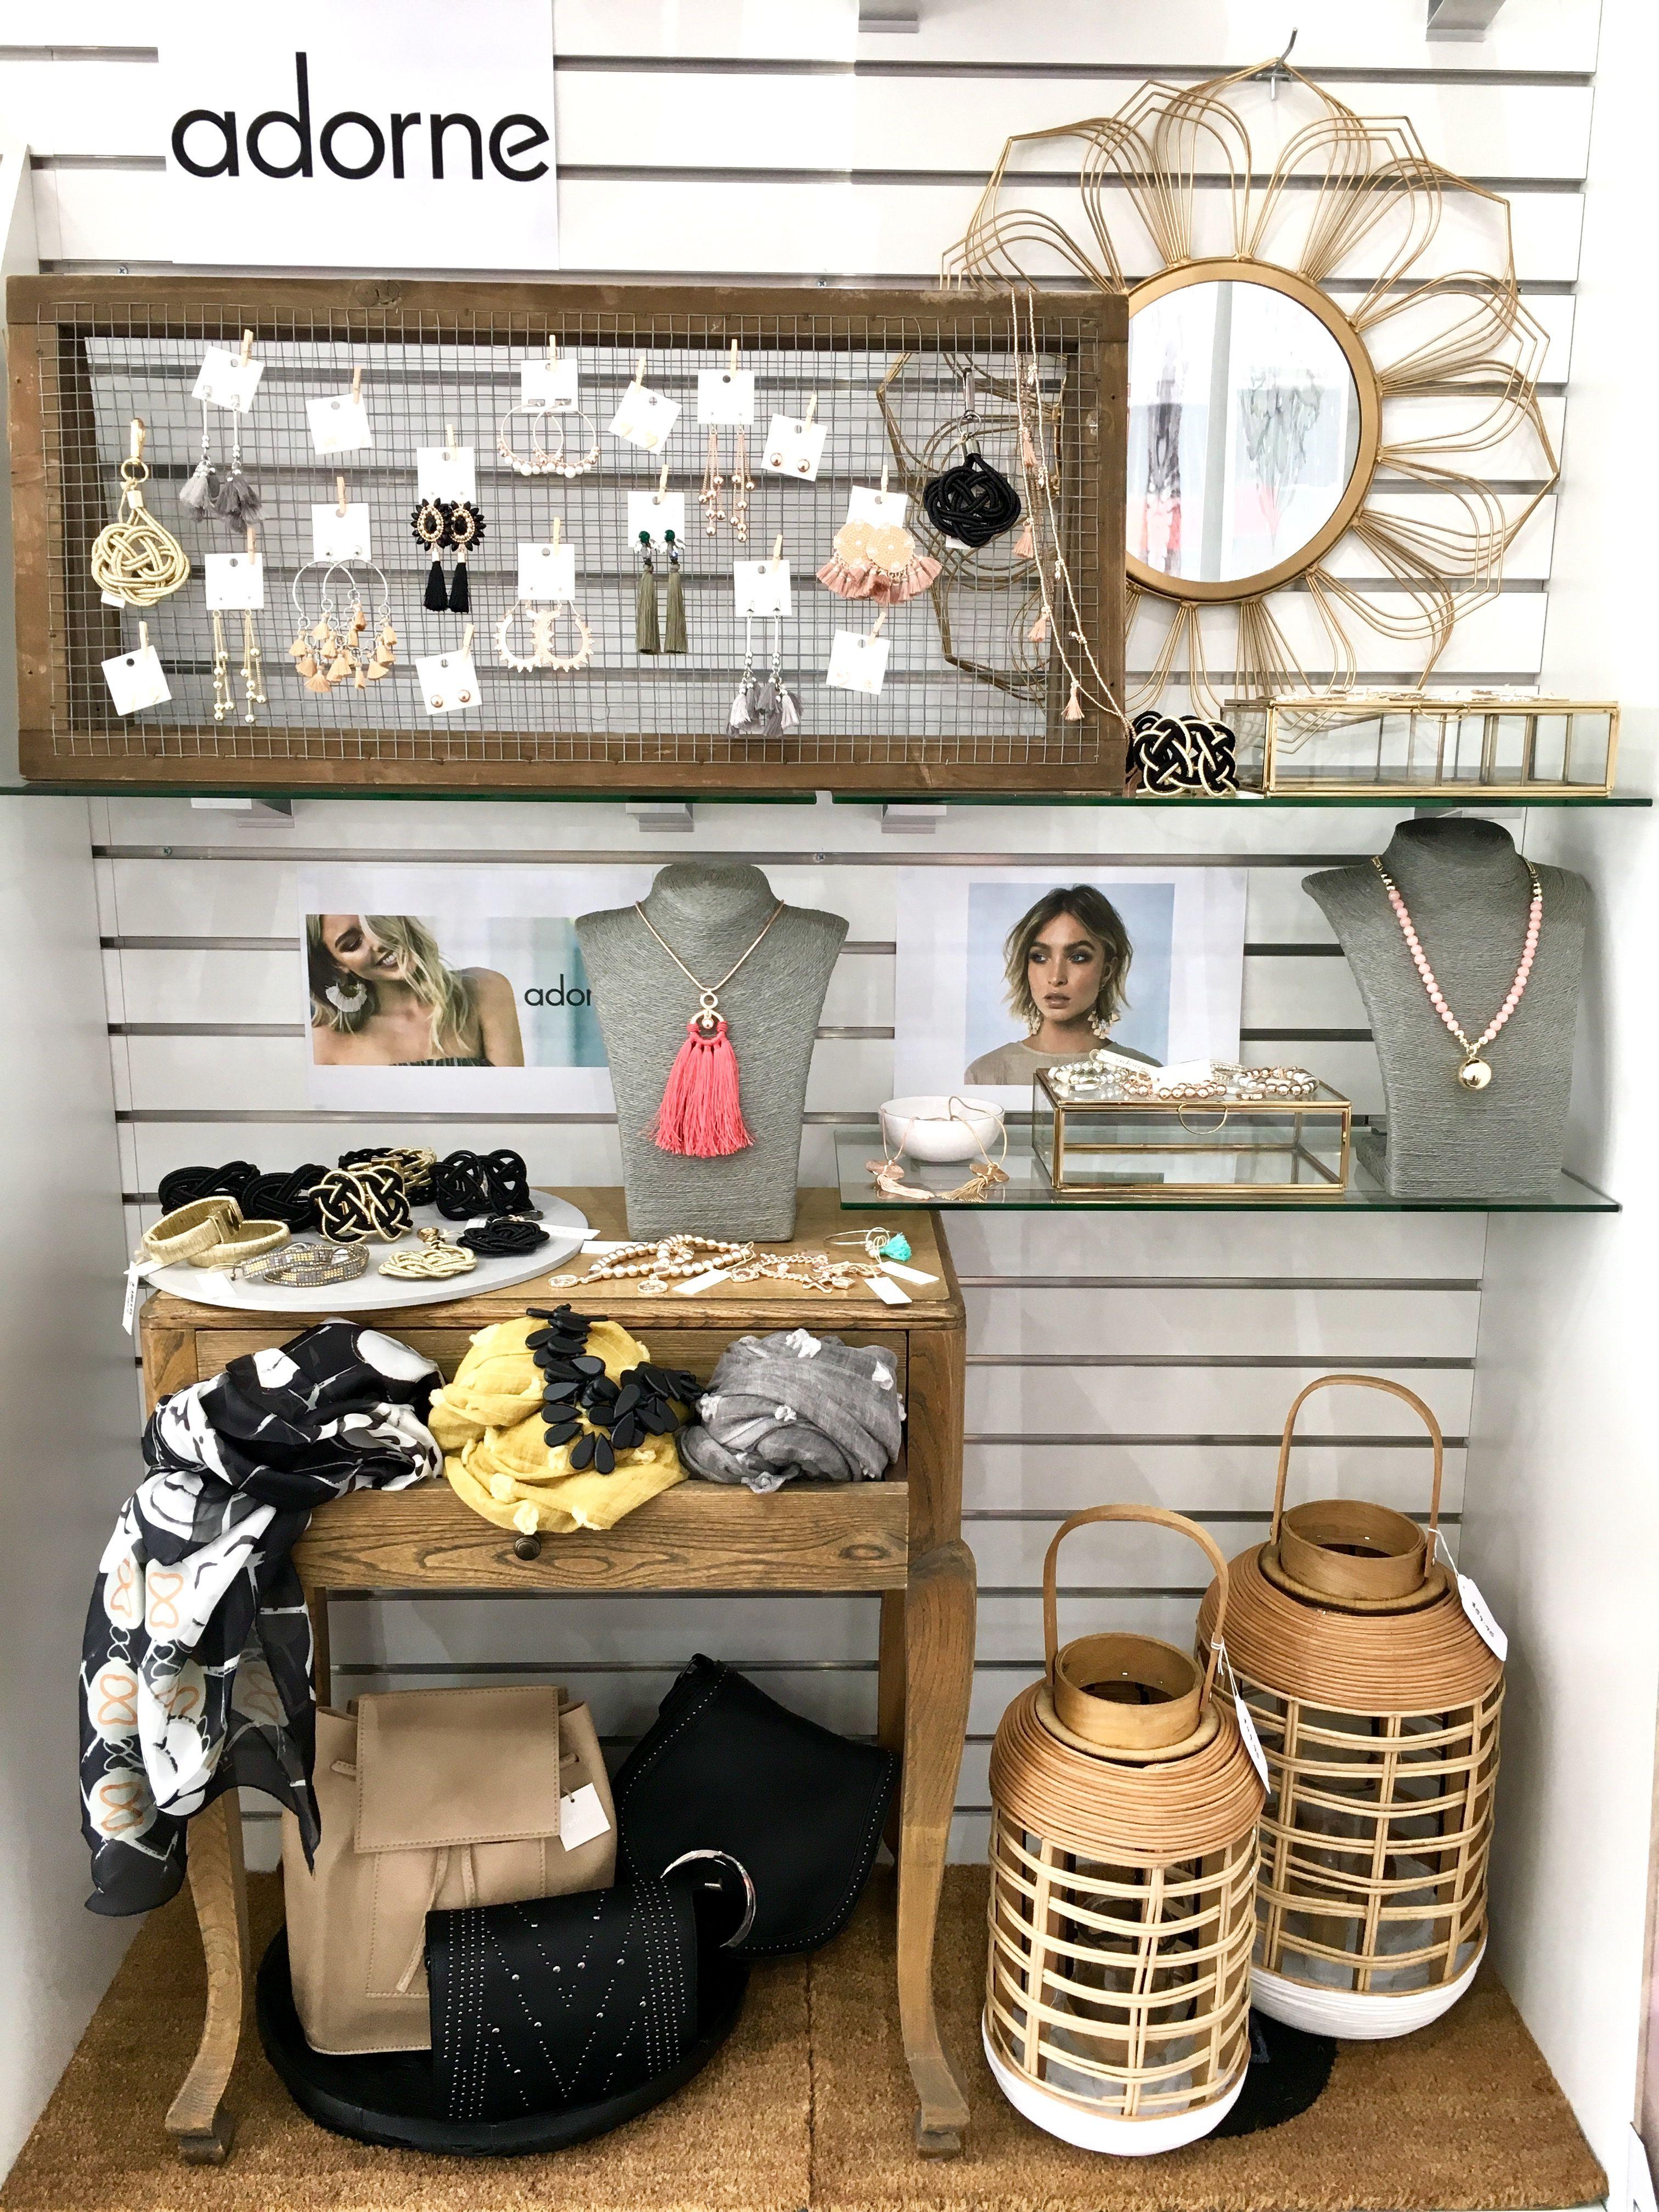 Slat Wall Merchandising Sleekhomeandgifts Slat Wall Slat Wall Display Shop Interiors